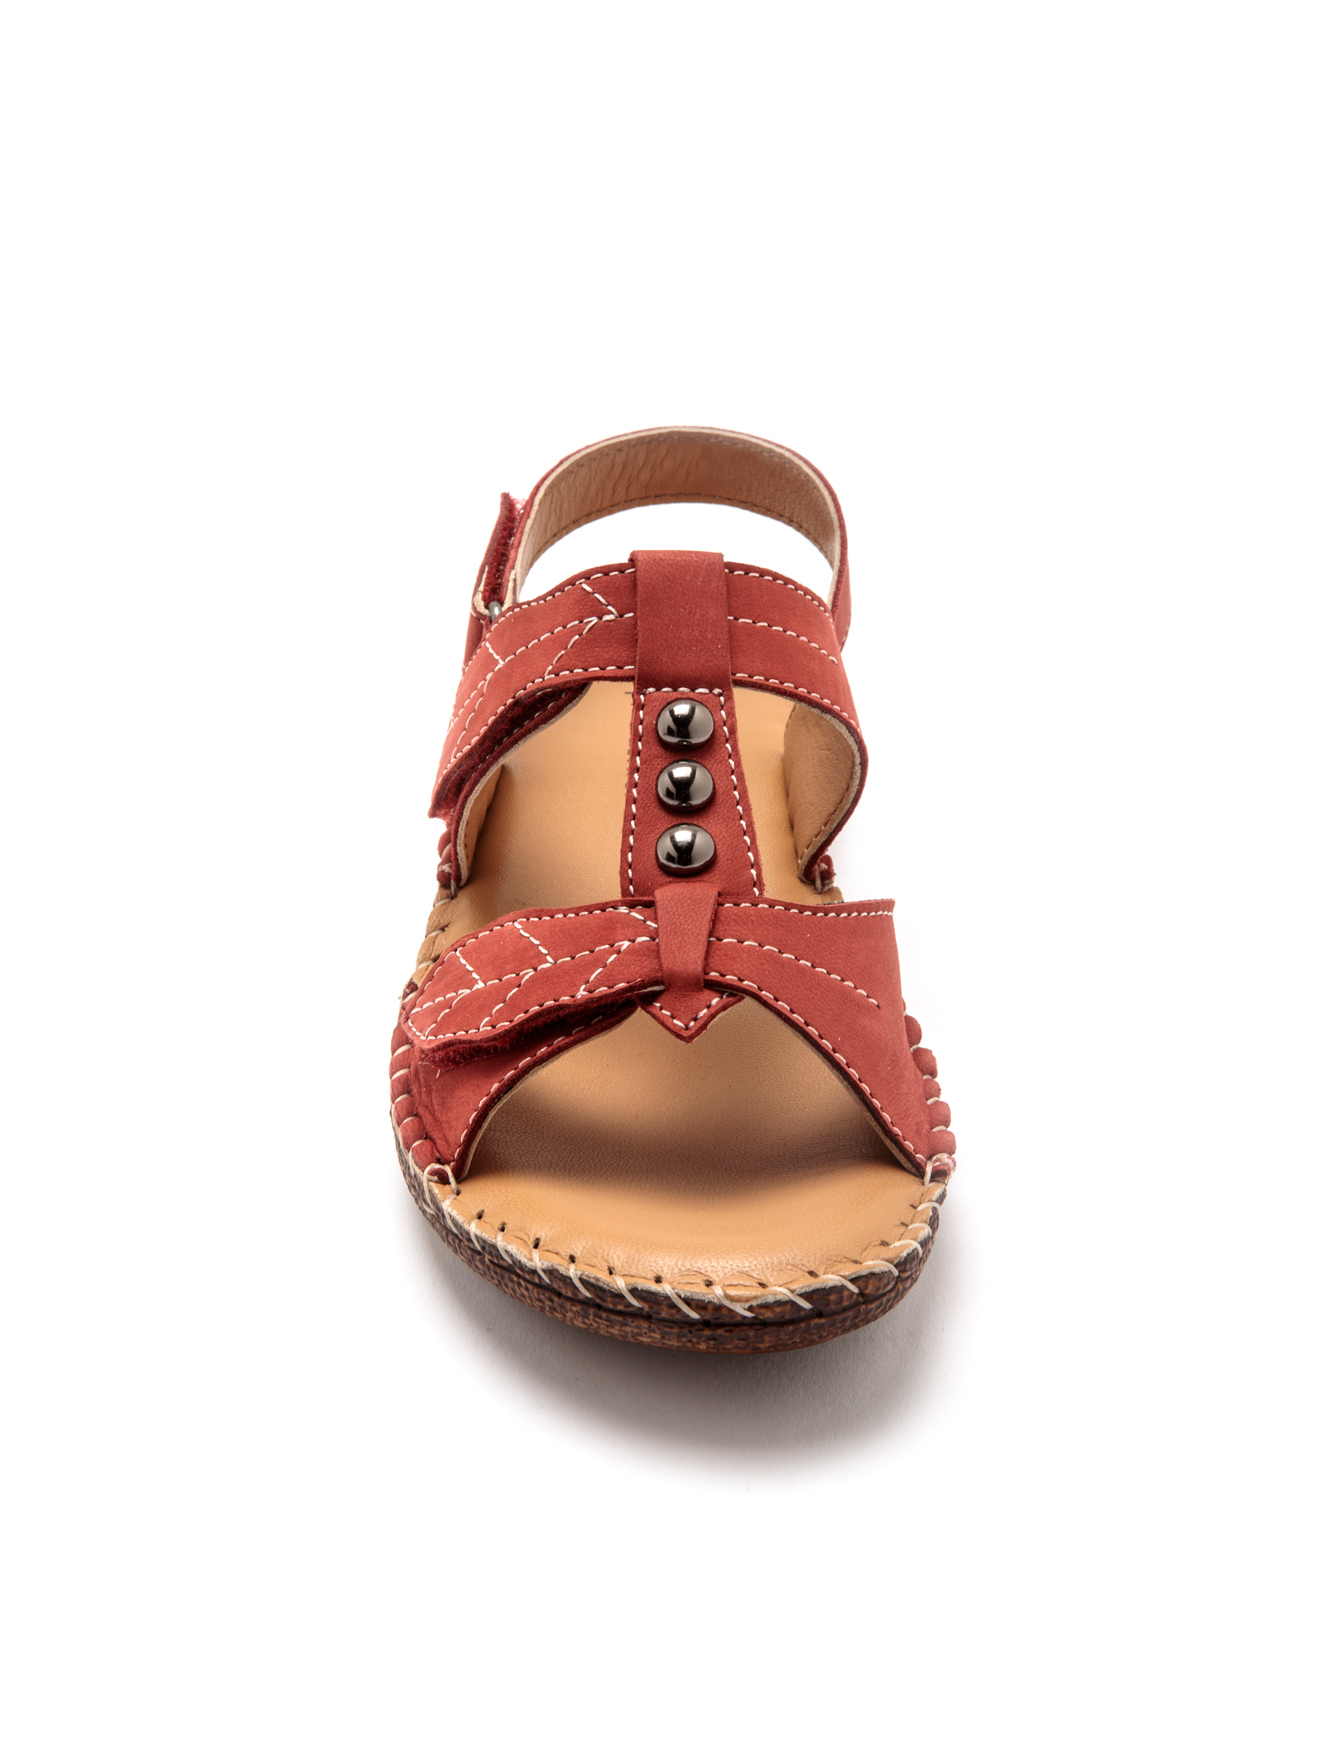 Souples Ultra Sandales Sandales Cuir Pediconfort® Cuir BxodWrCe